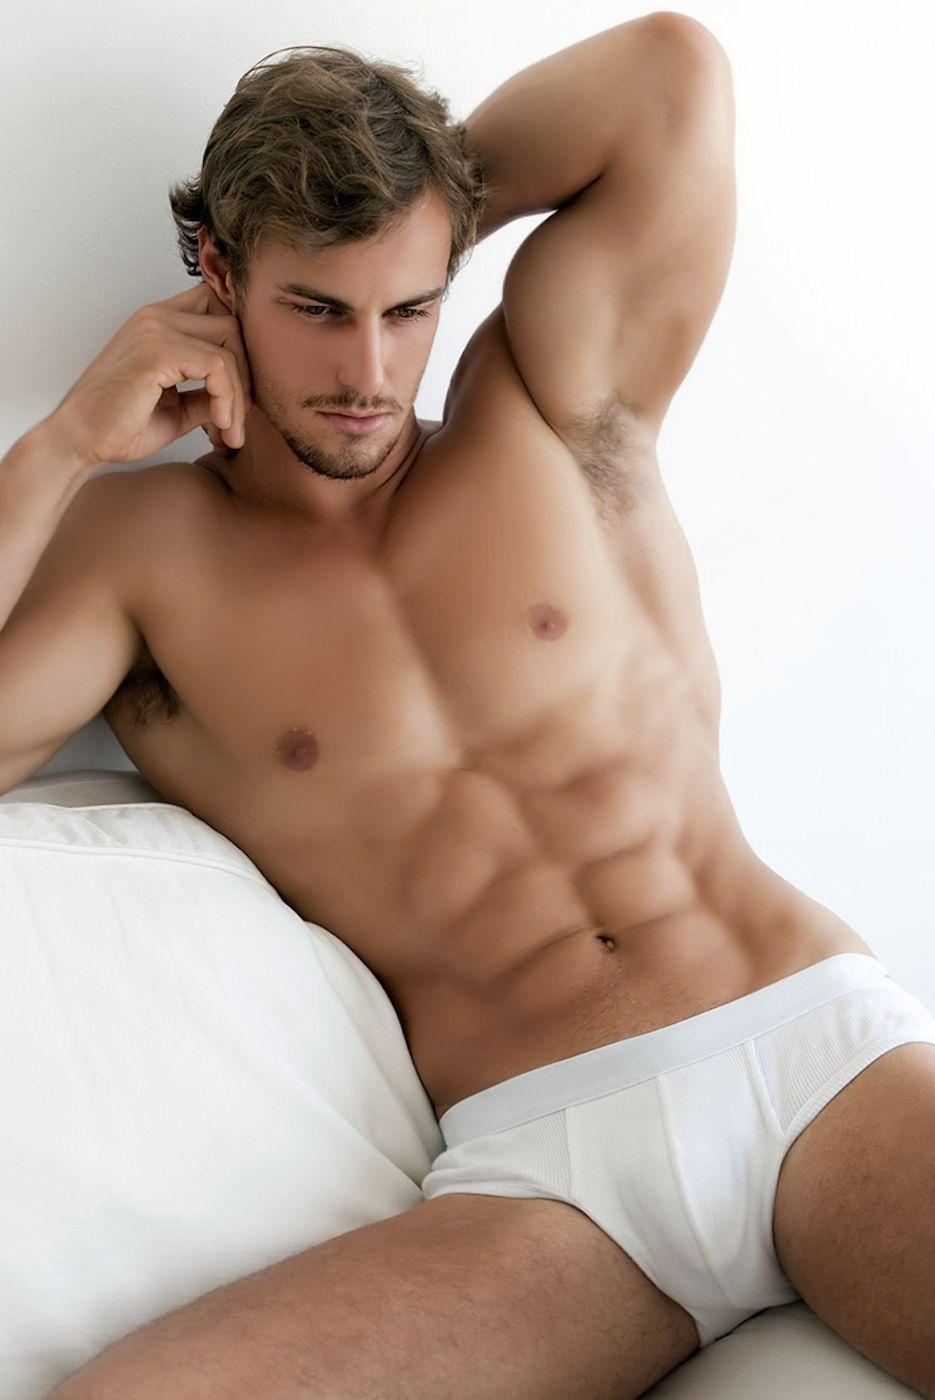 Asian Gay Underwear Links